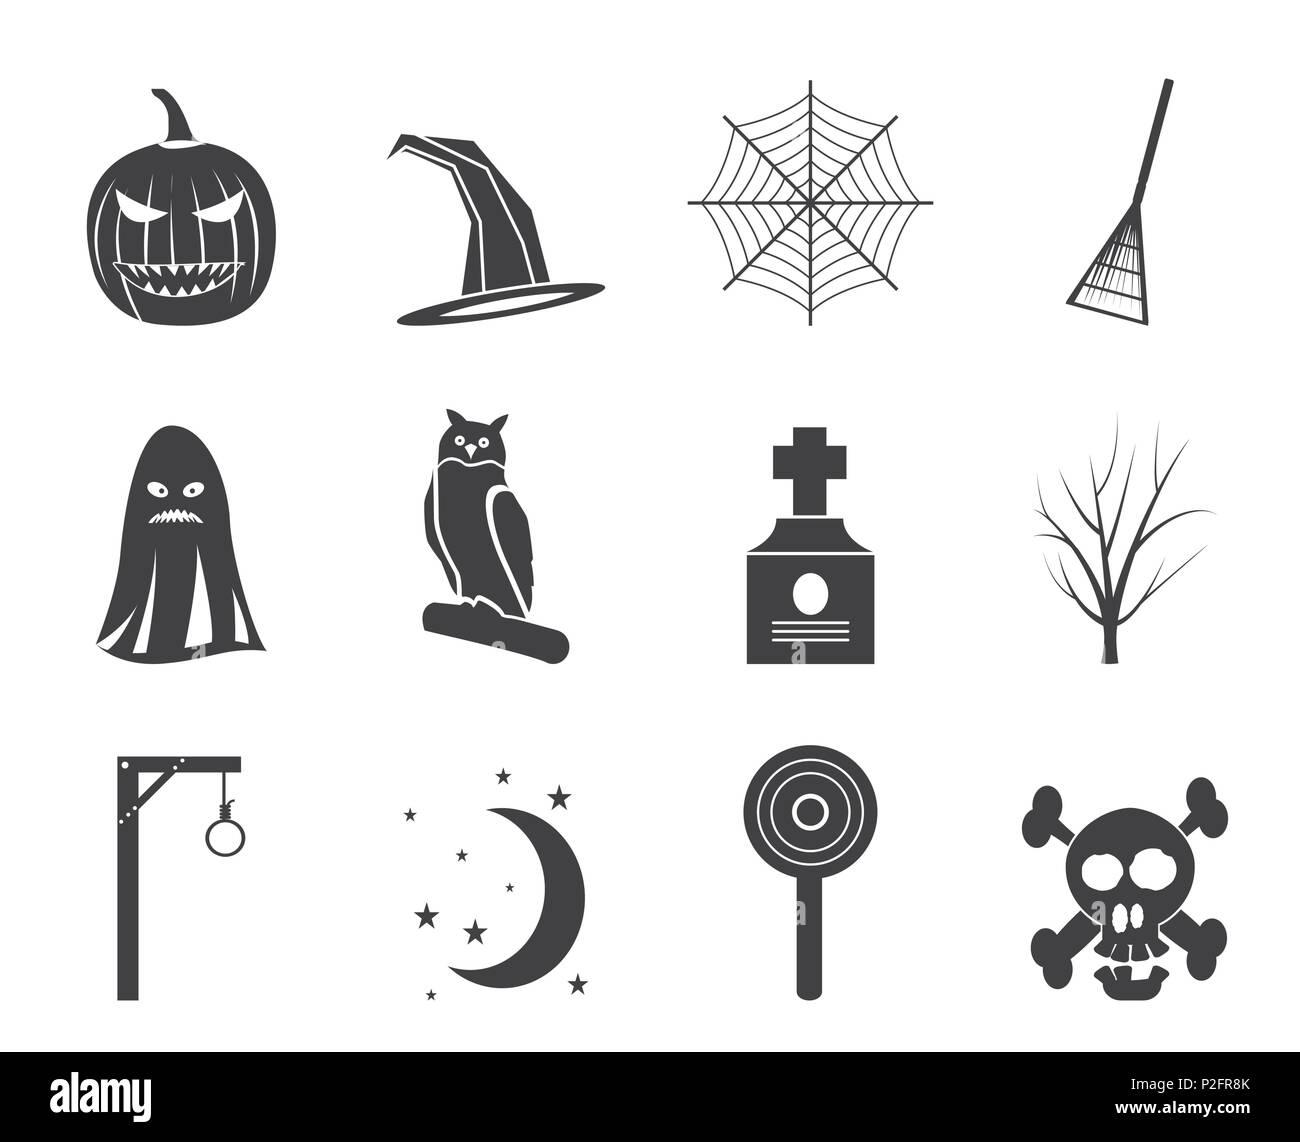 Silhouette Halloween Icon Pack Mit Fledermaus Kurbis Hexe Ghost